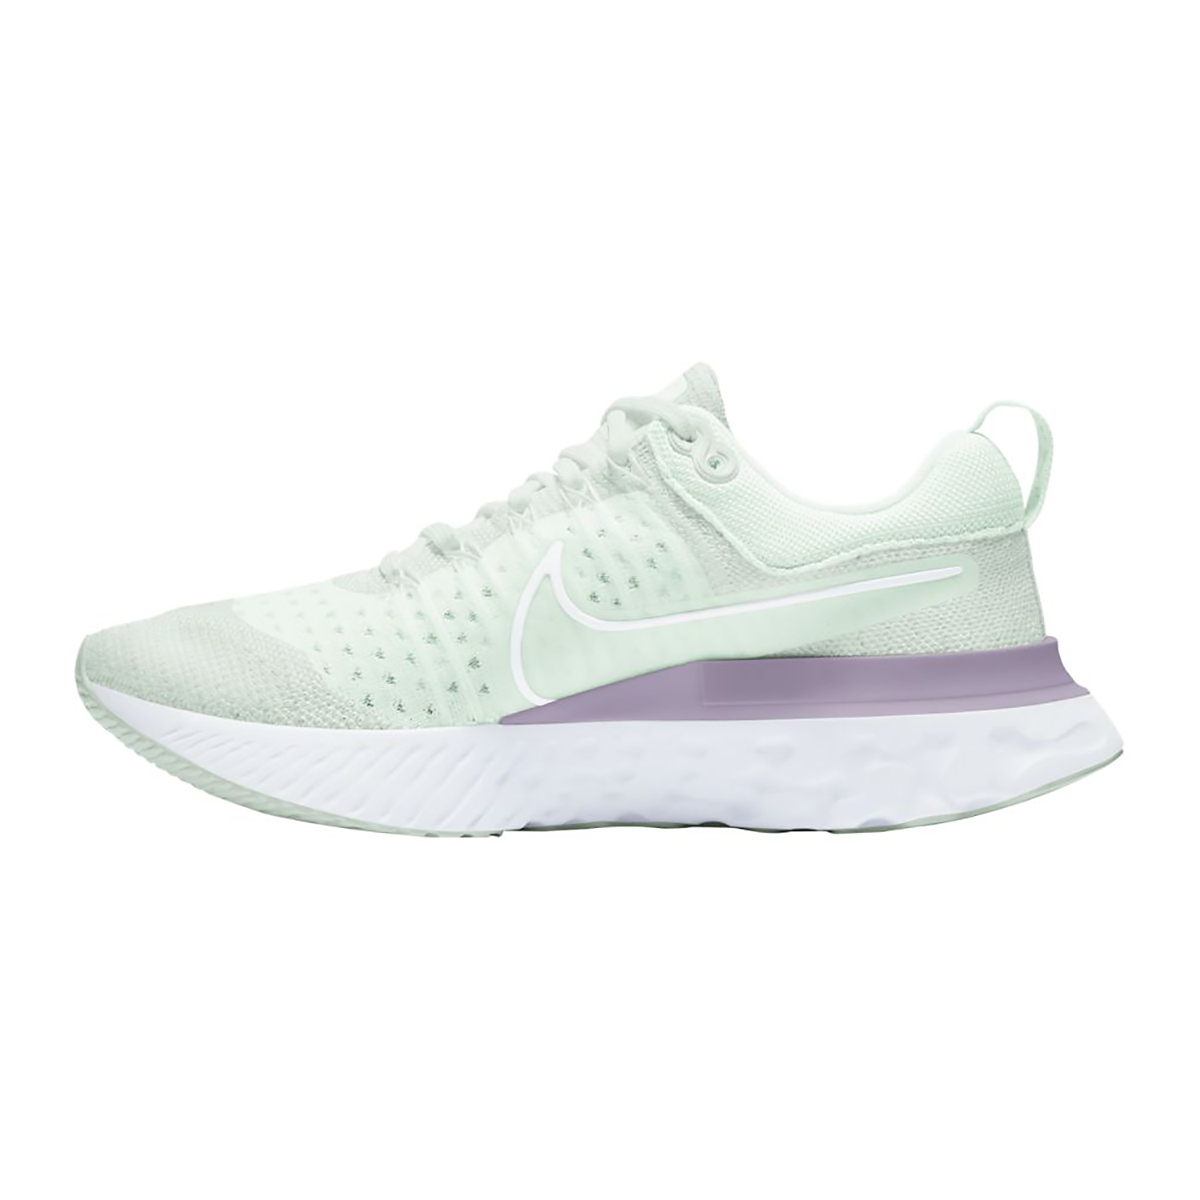 Women's Nike React Infinity Run Flyknit 2 Running Shoe - Color: Light Silver/White/Lilac - Size: 5.5 - Width: Regular, Light Silver/White/Lilac, large, image 2